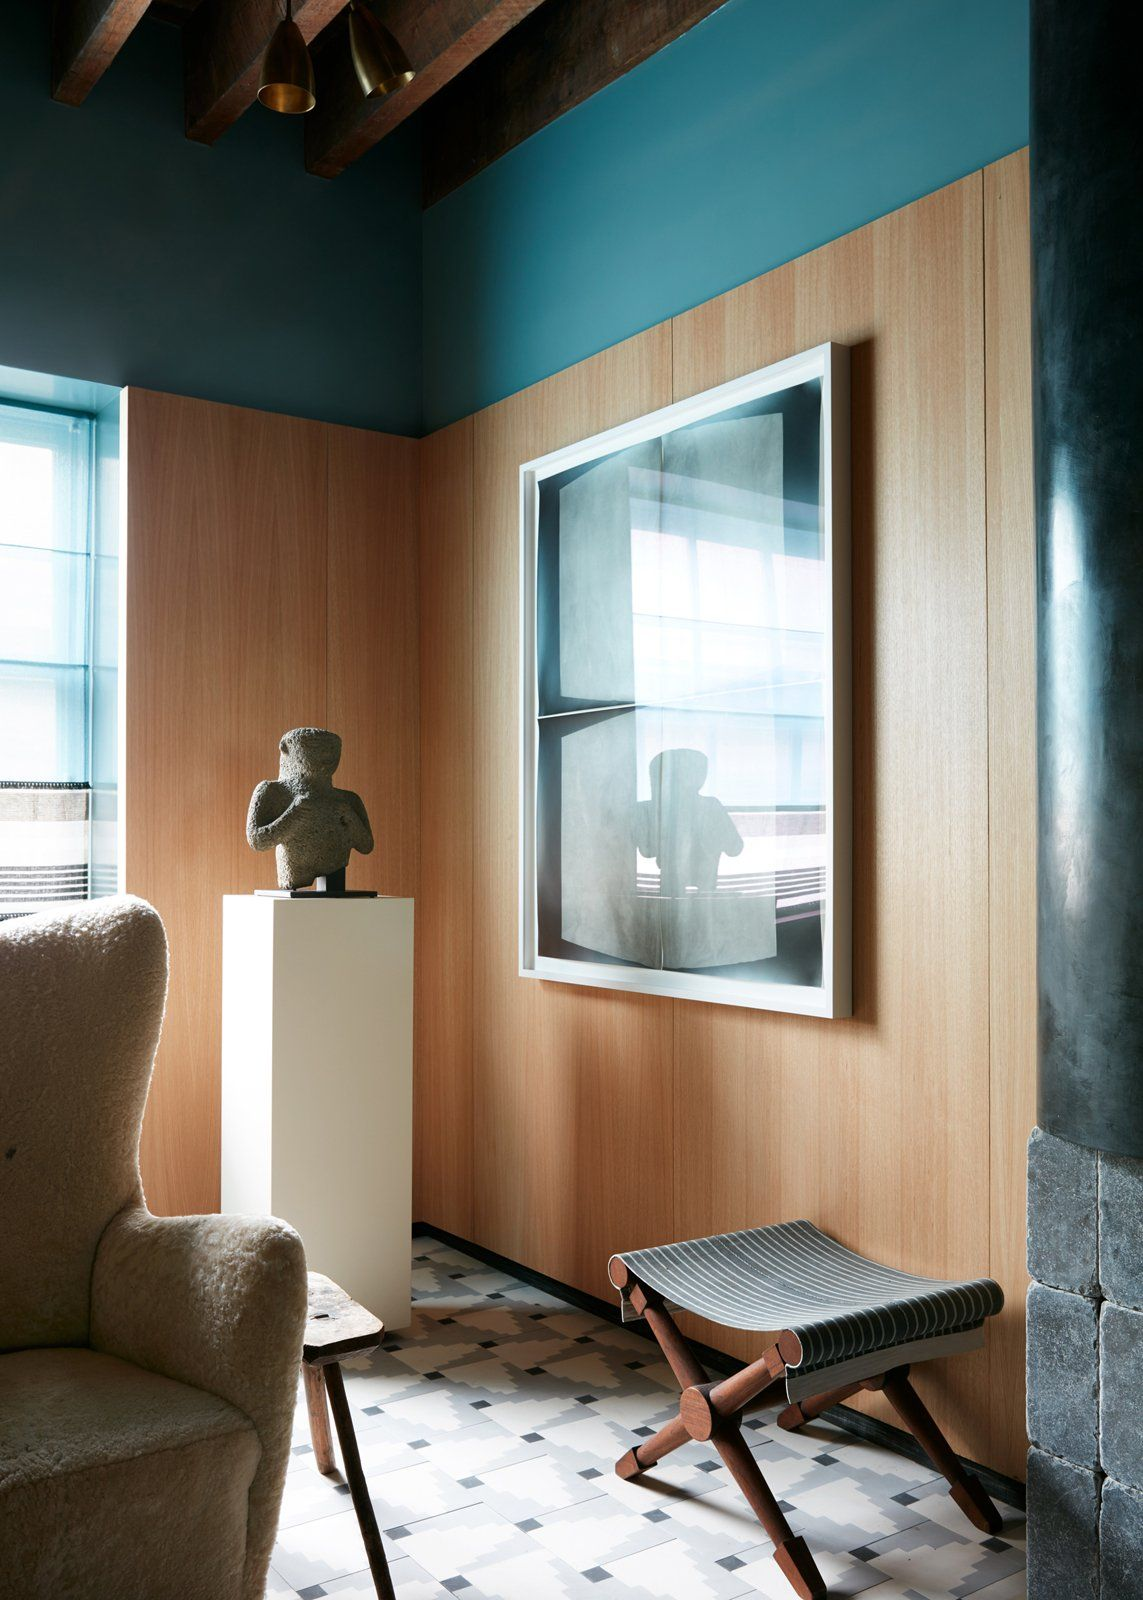 See More Of Neal Beckstedt Studio S Kips Bay Room 2017 On 1stdibs